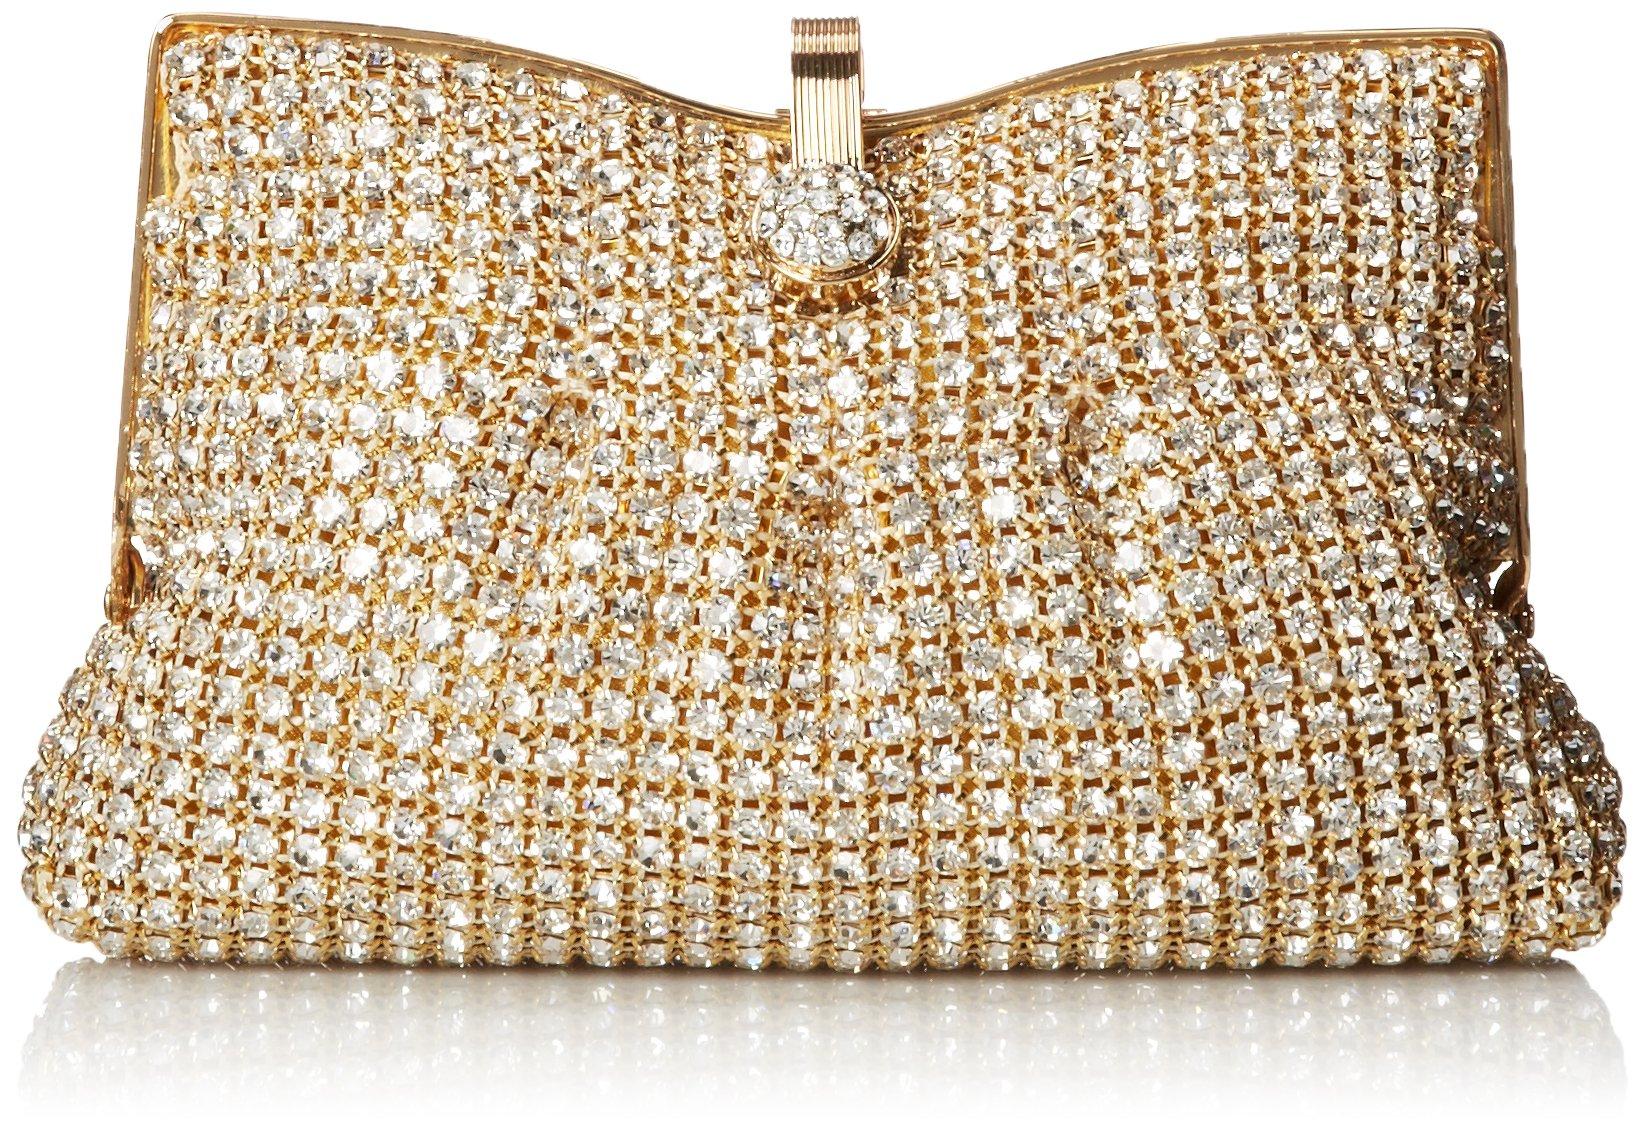 La Regale Fully Rhinestone Clutch,Gold,One Size